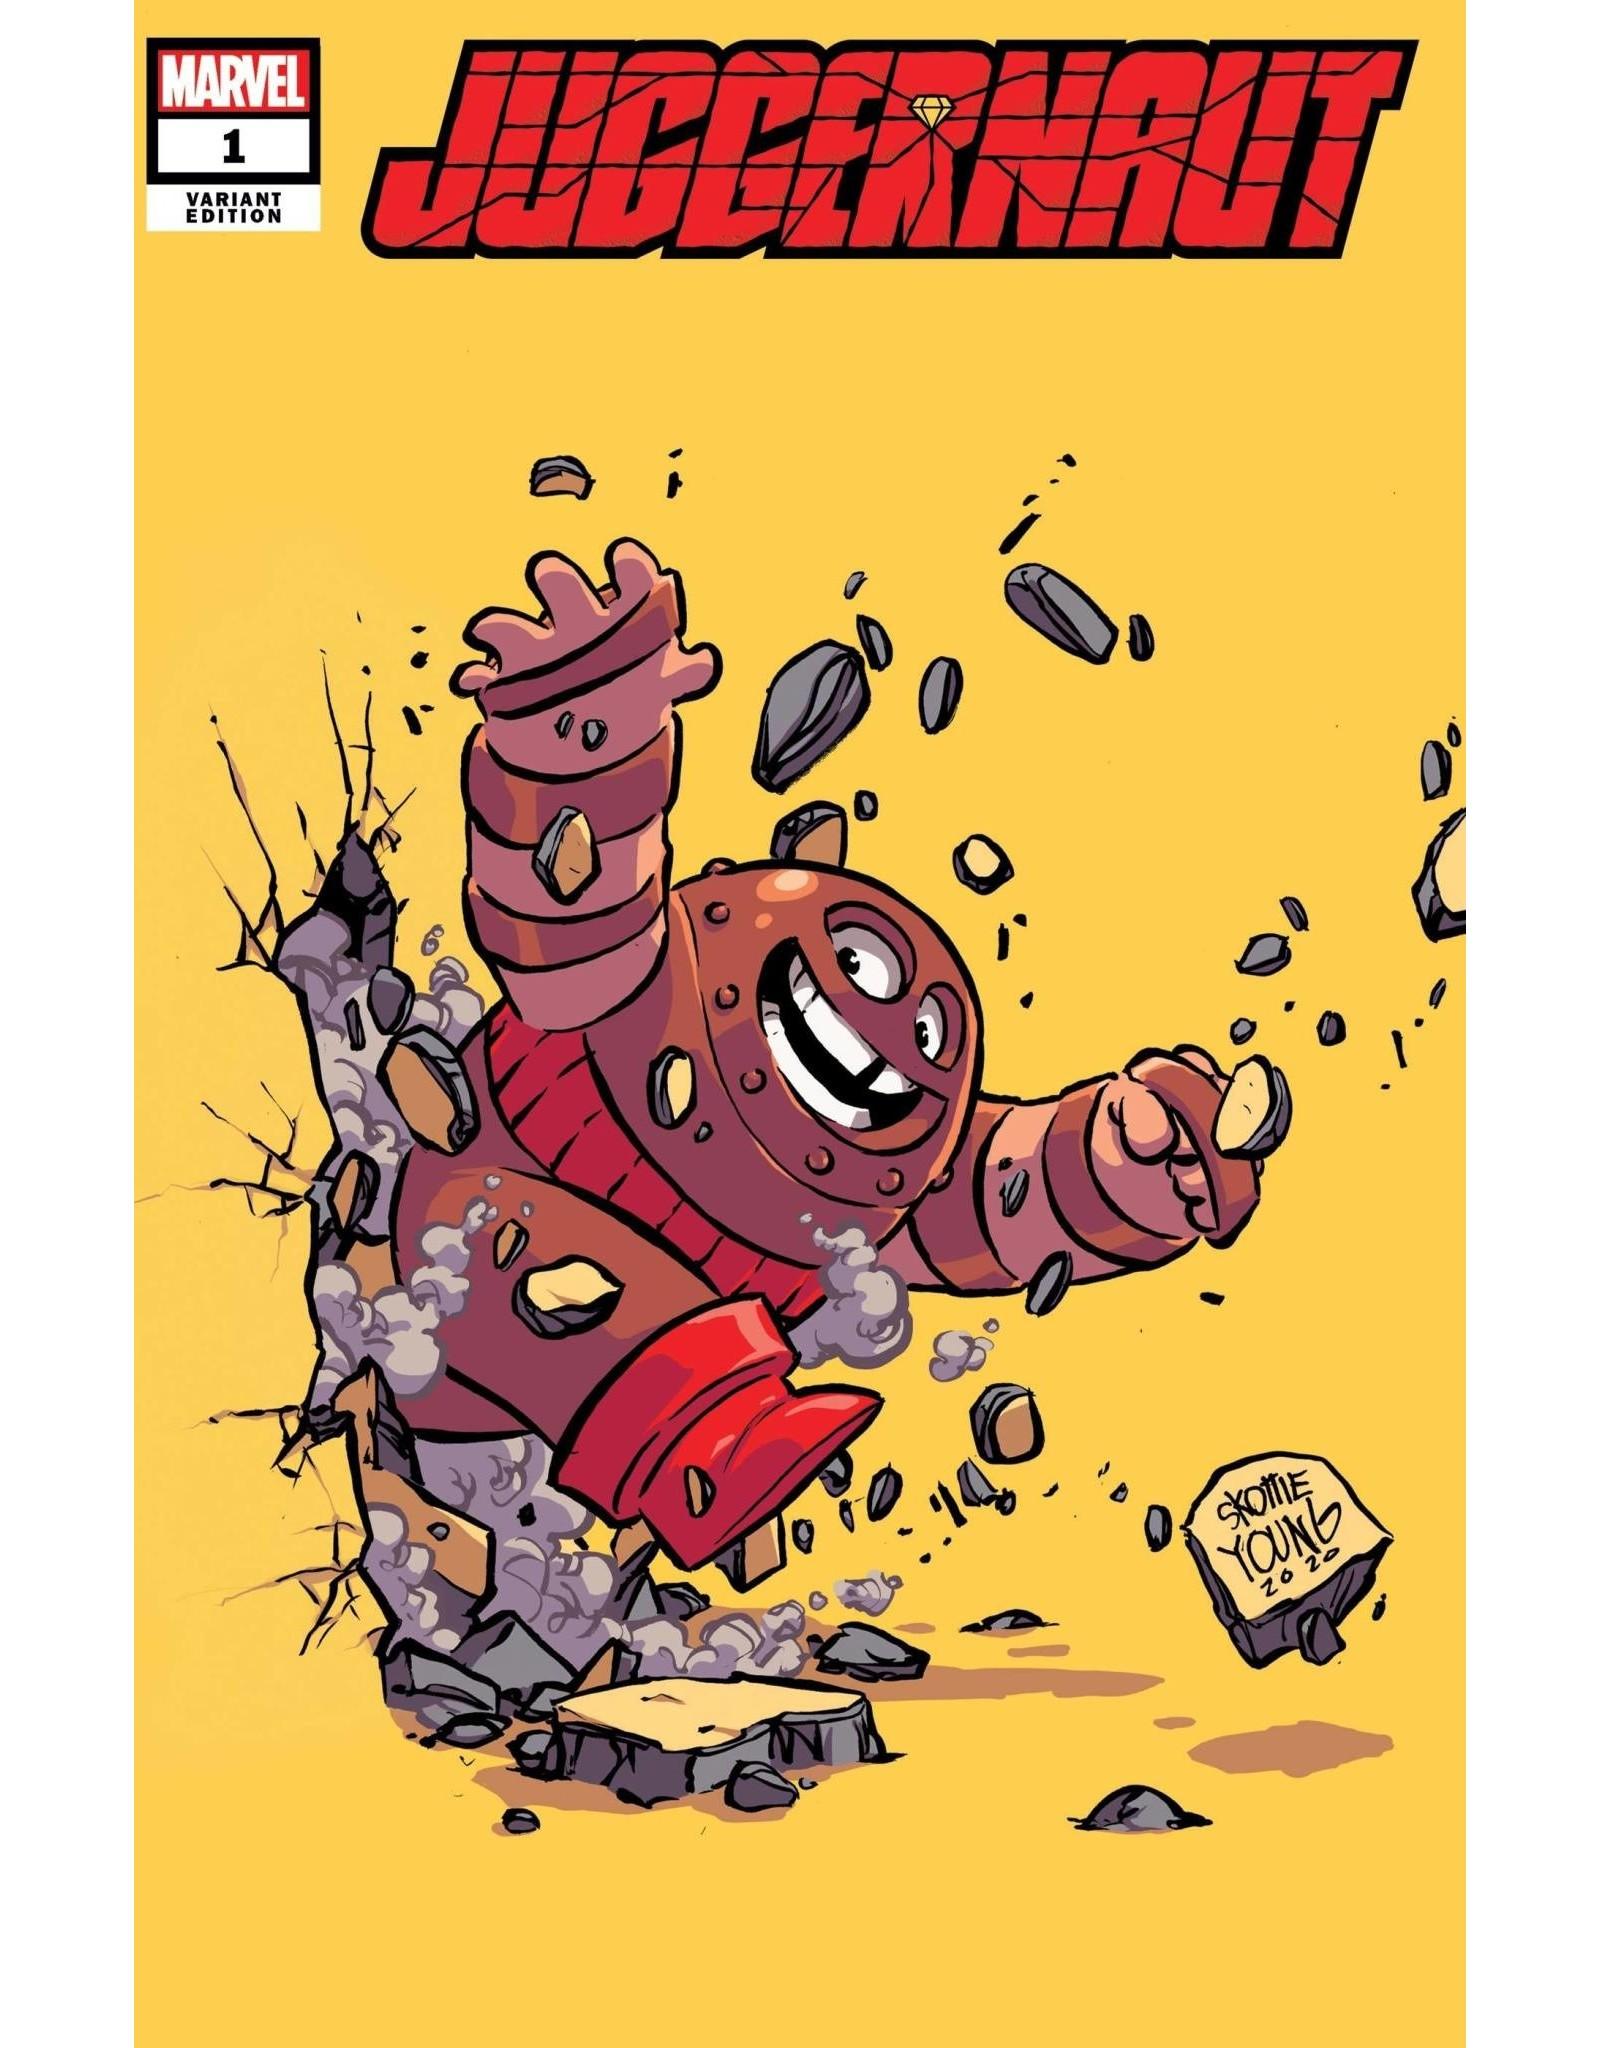 Marvel Comics JUGGERNAUT #1 (OF 5) YOUNG VAR DX